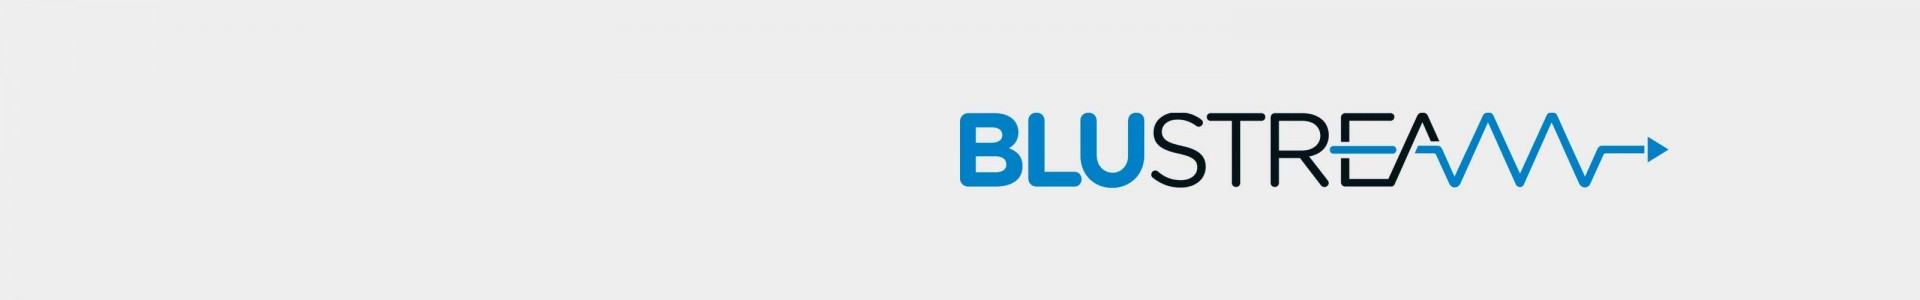 Blustream HDMI Video Extenders at Avacab Audiovisuales